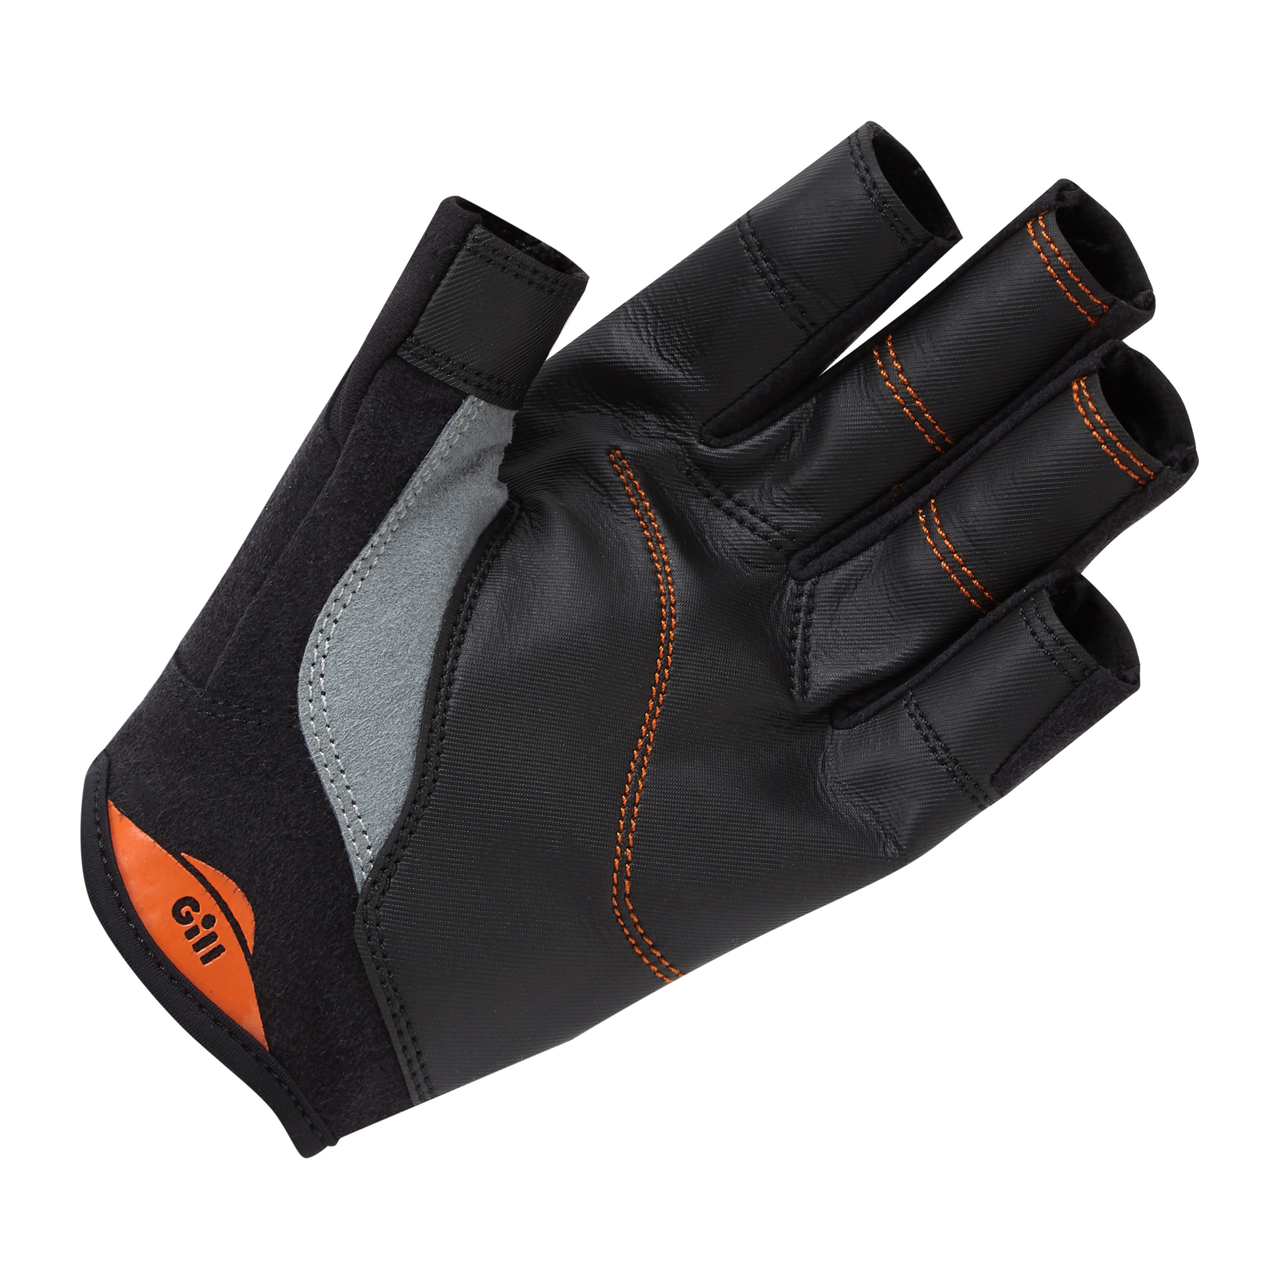 gill-championship-glove-short-2021-7243-2-36049.1615438826.jpg